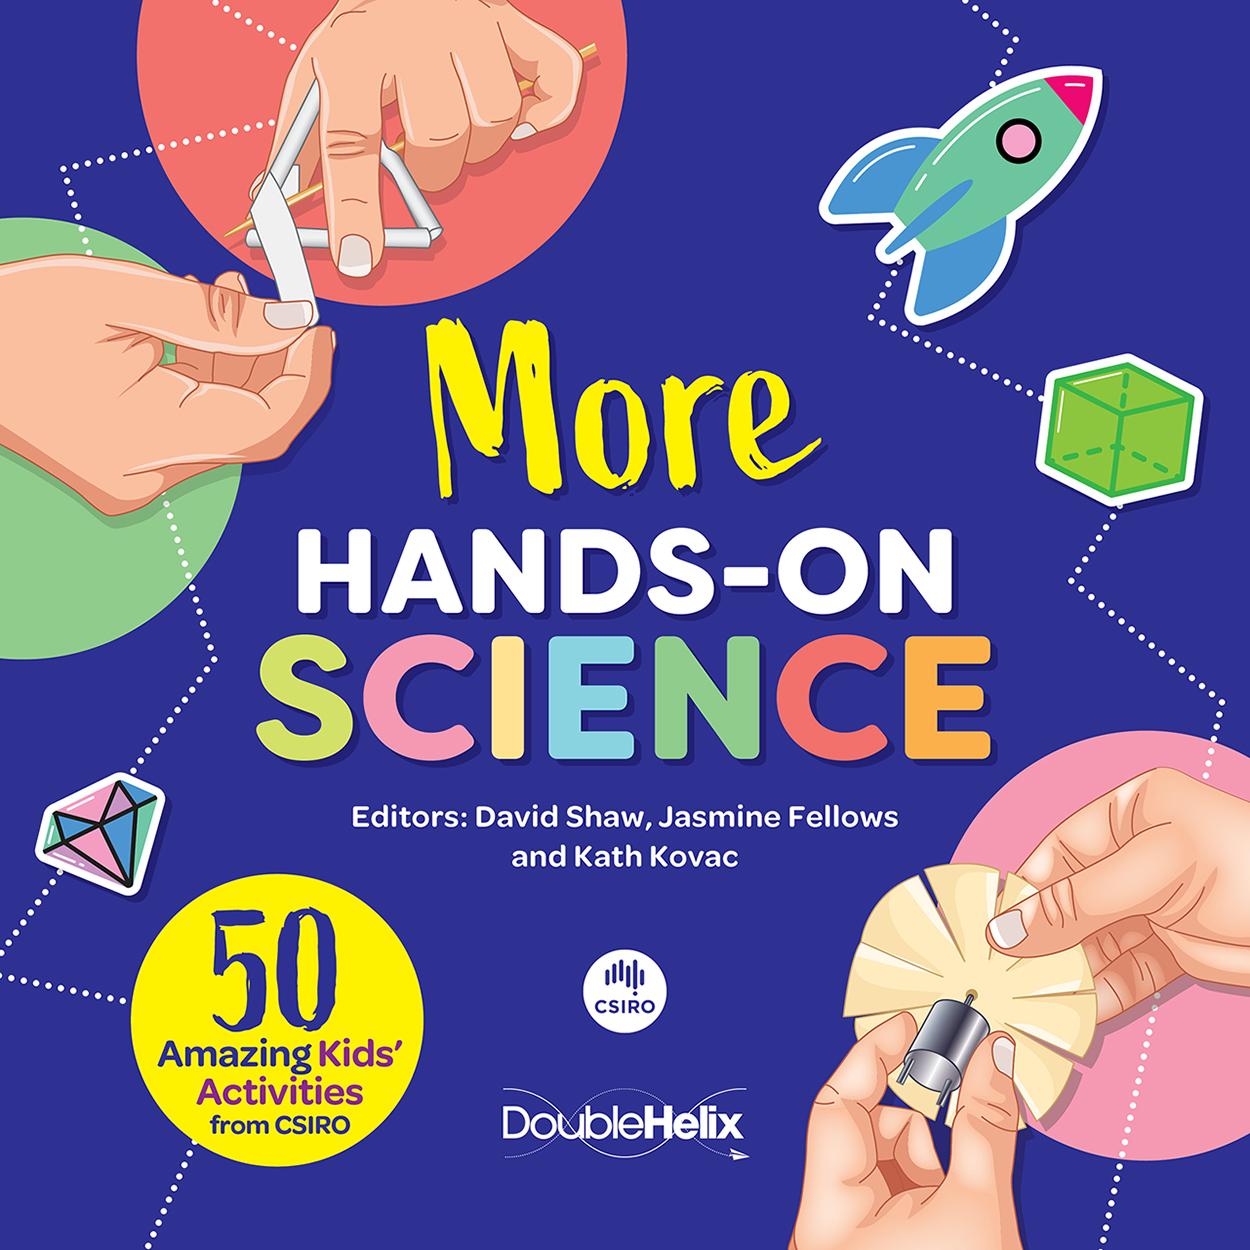 More Hands-On Science: 50 Amazing Kids' Activities from CSIRO